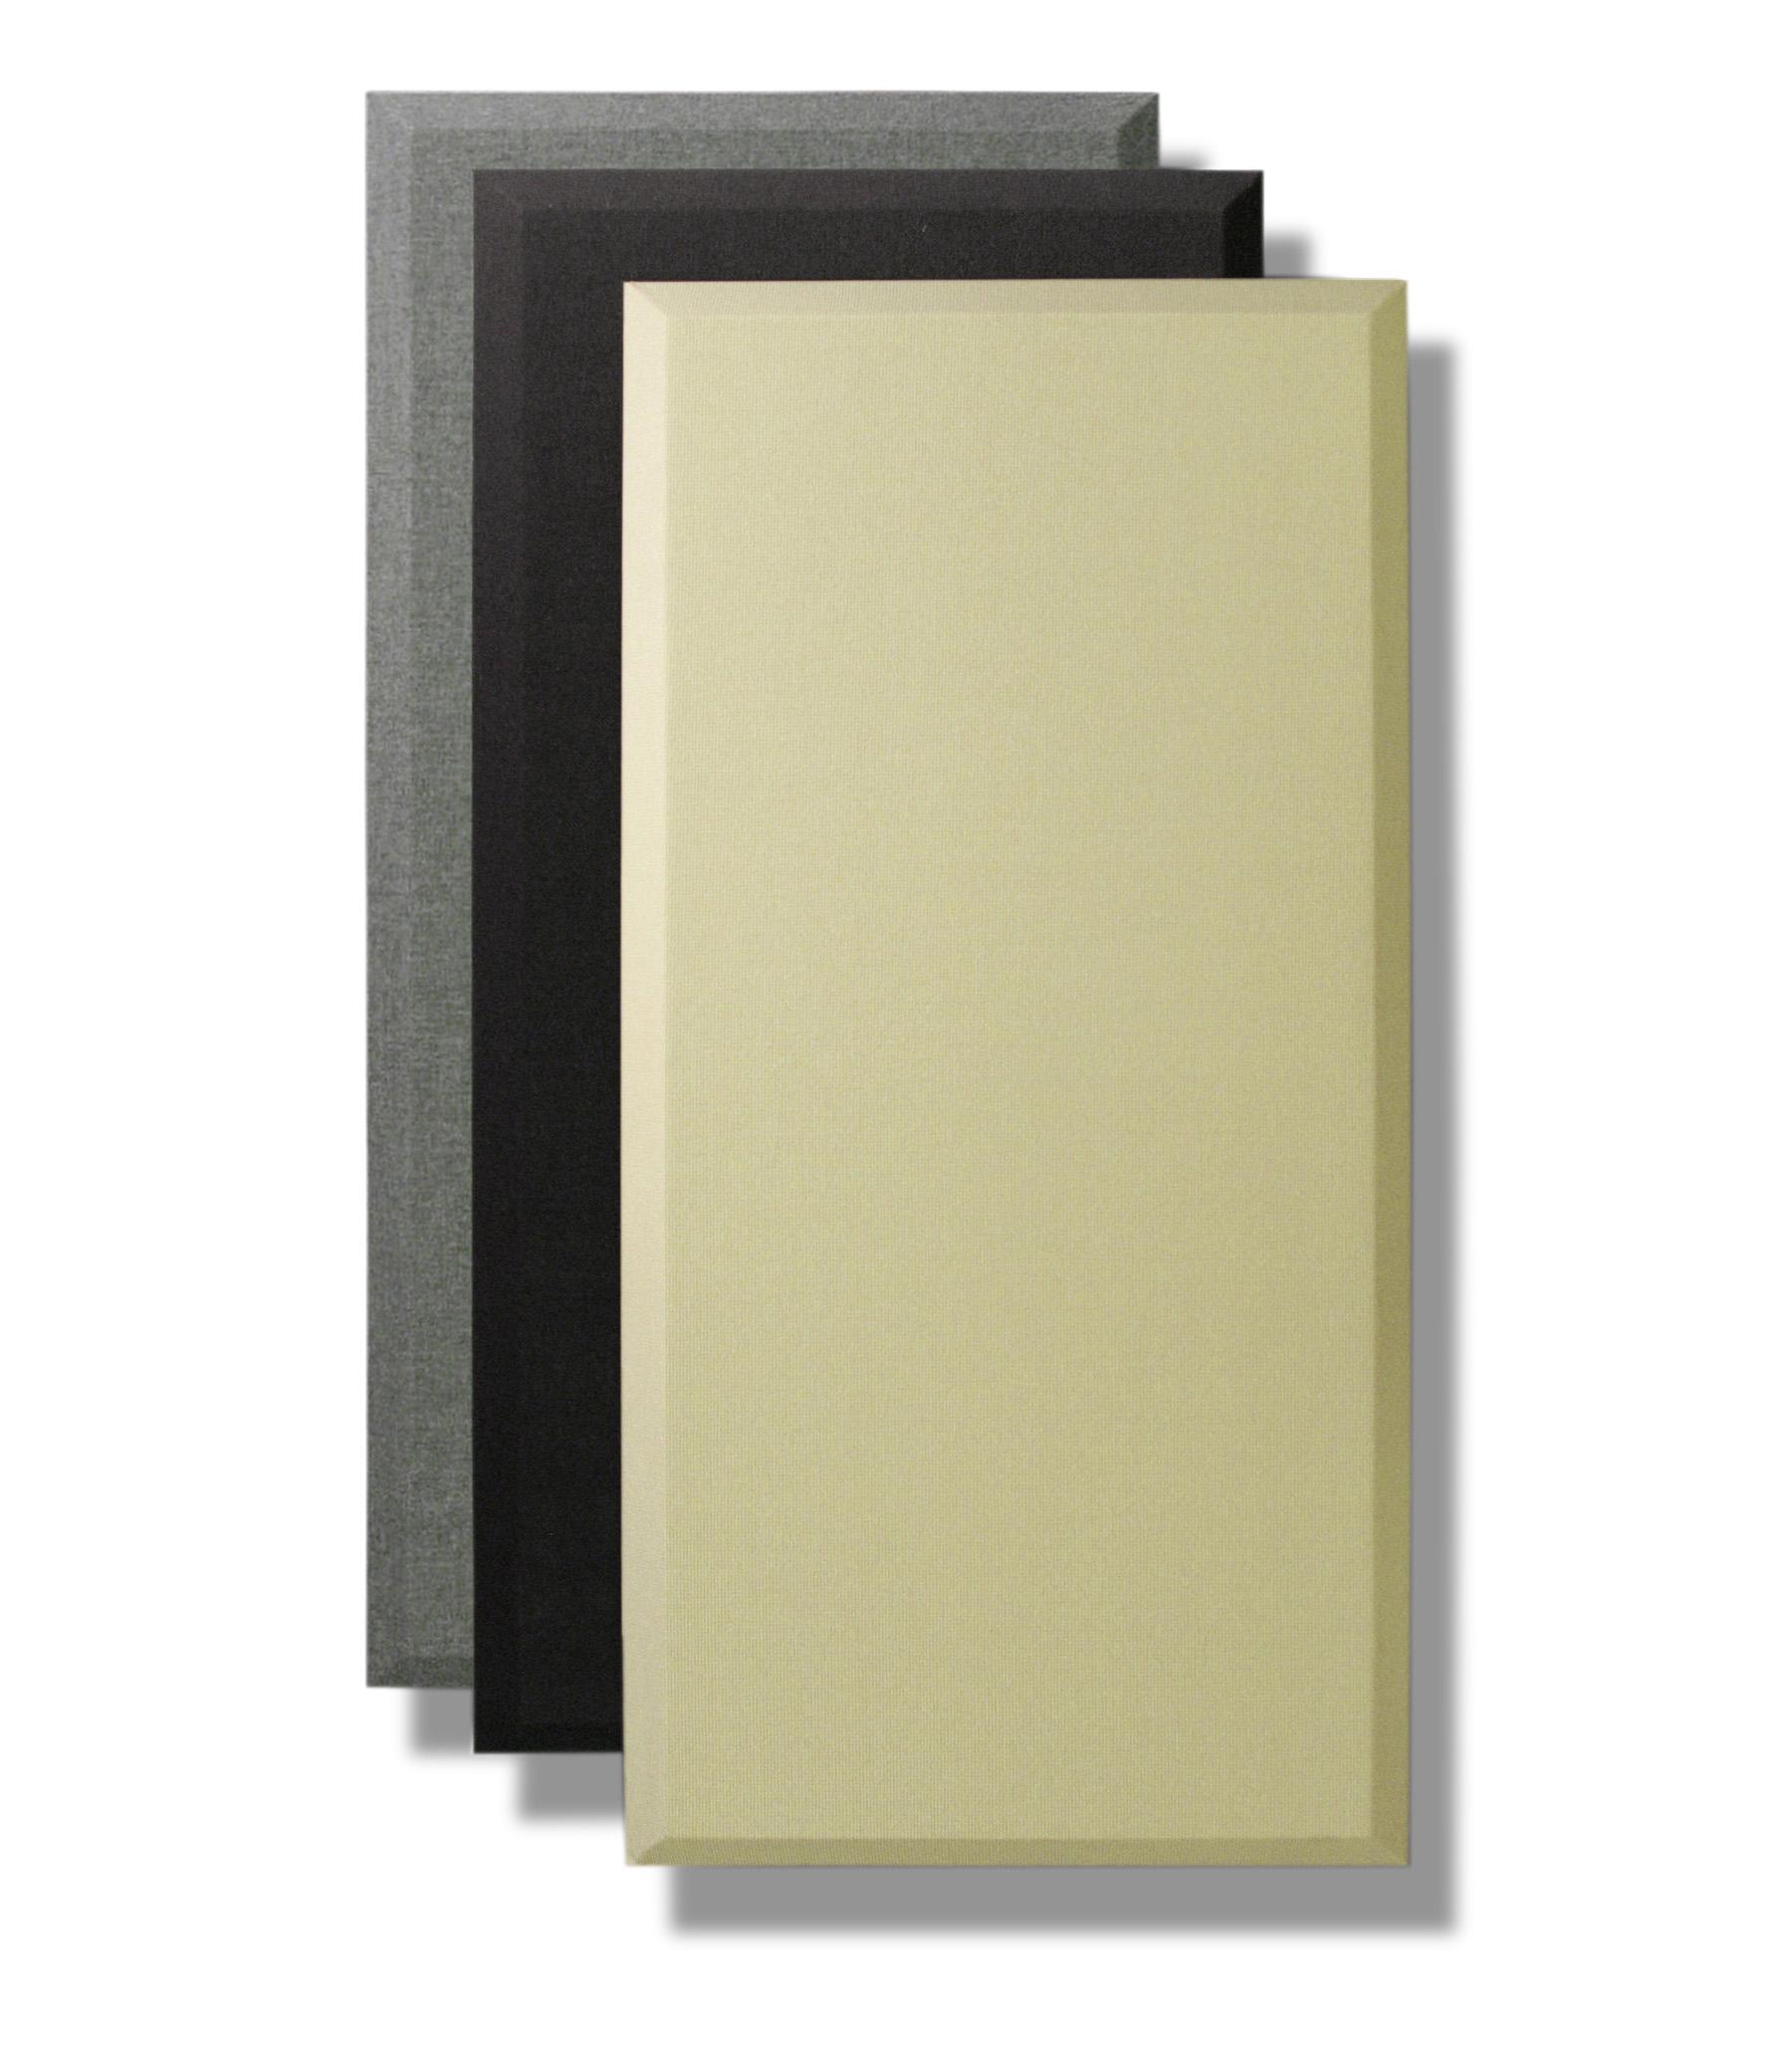 Buy Primacoustic - 2 BEVLD 24X48 GREY